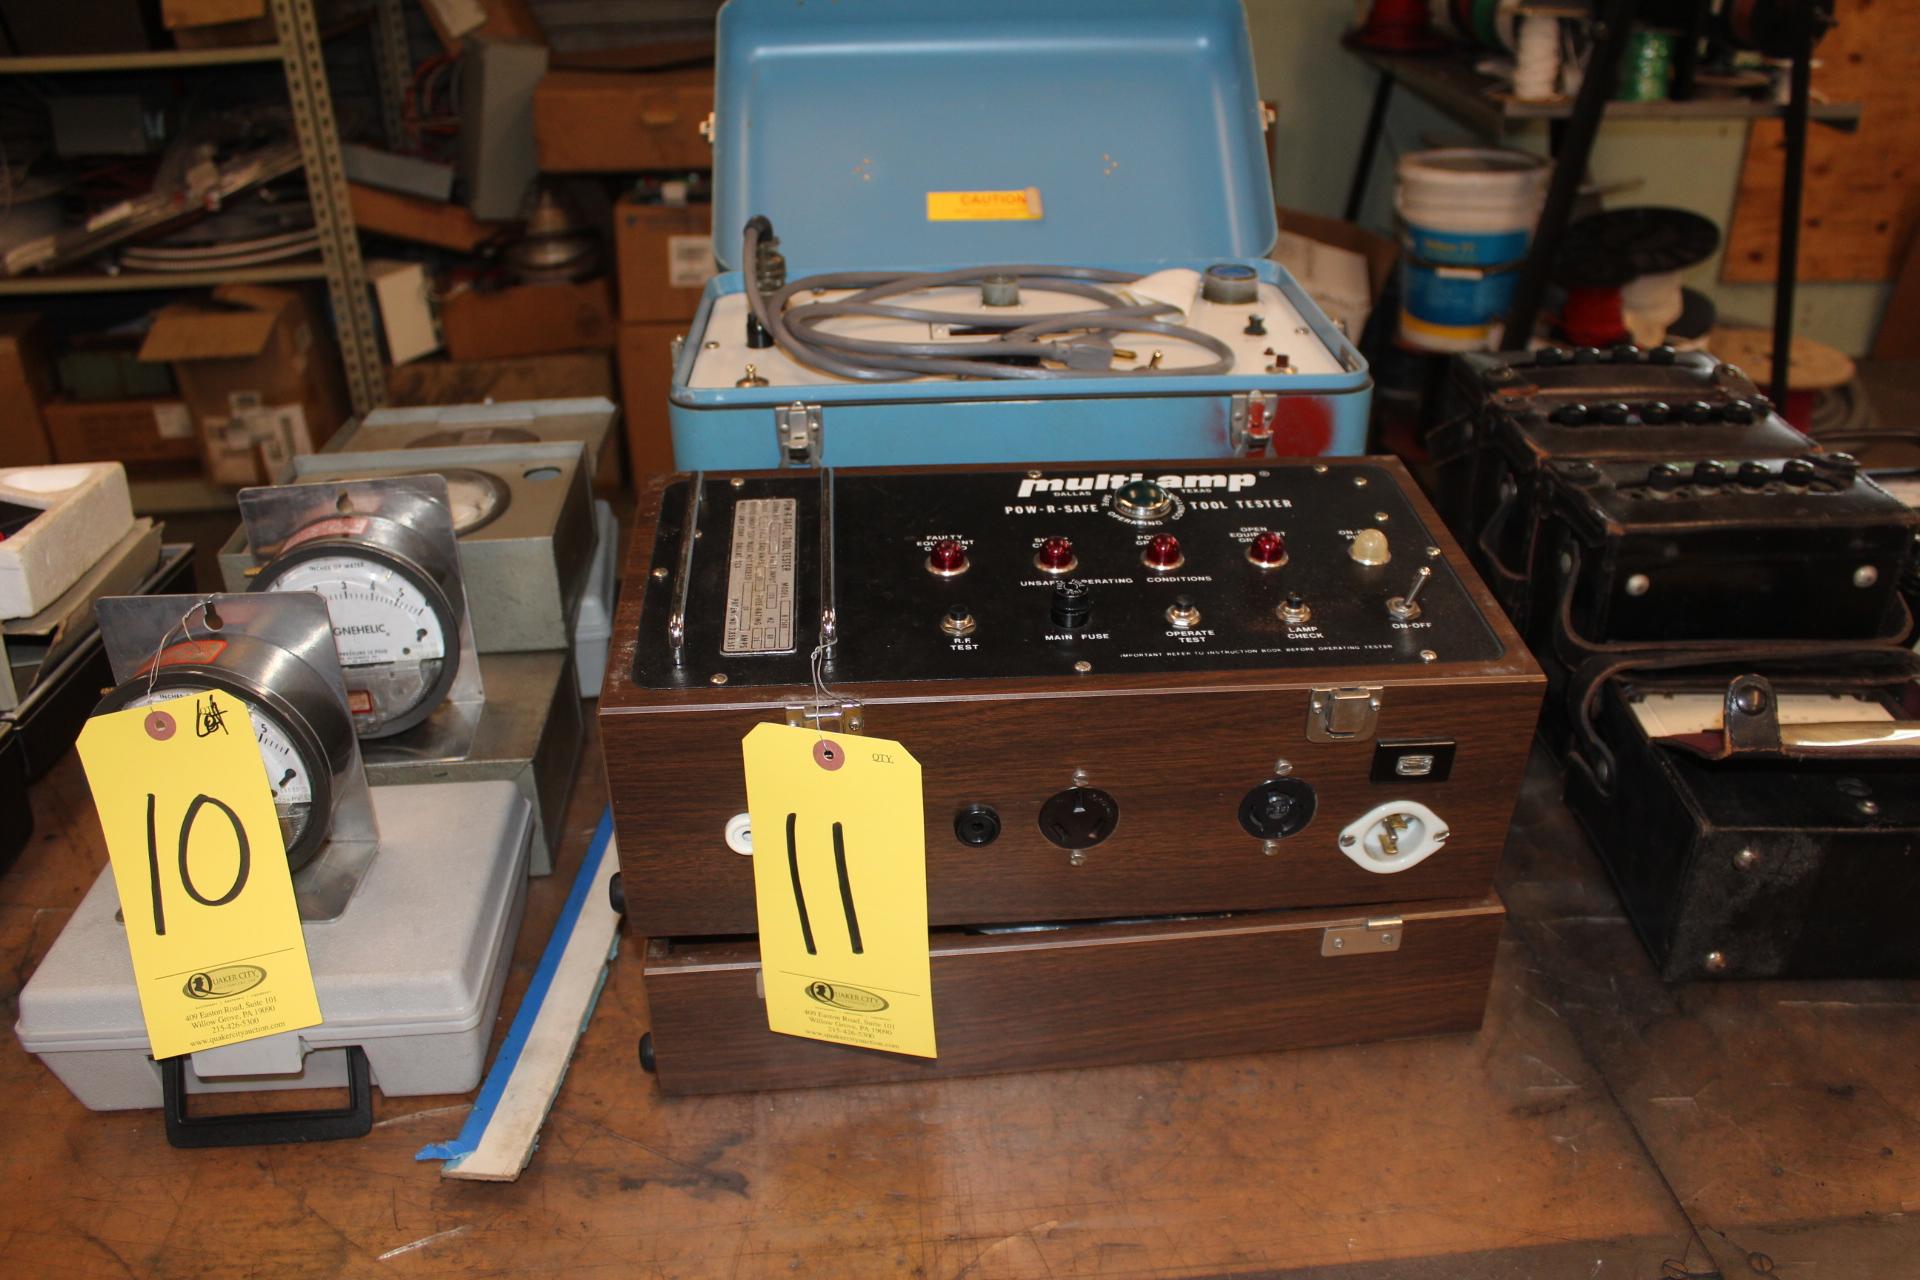 BIDDLE DLRO & MULTI-AMP POW-R-SAFE TOOL TESTER